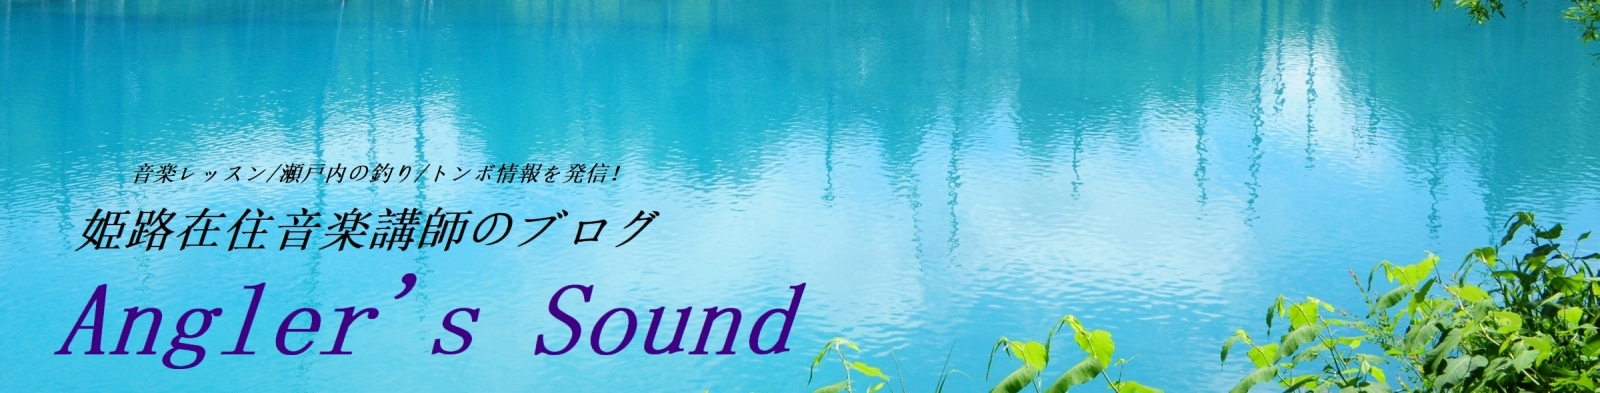 Angler's Sound